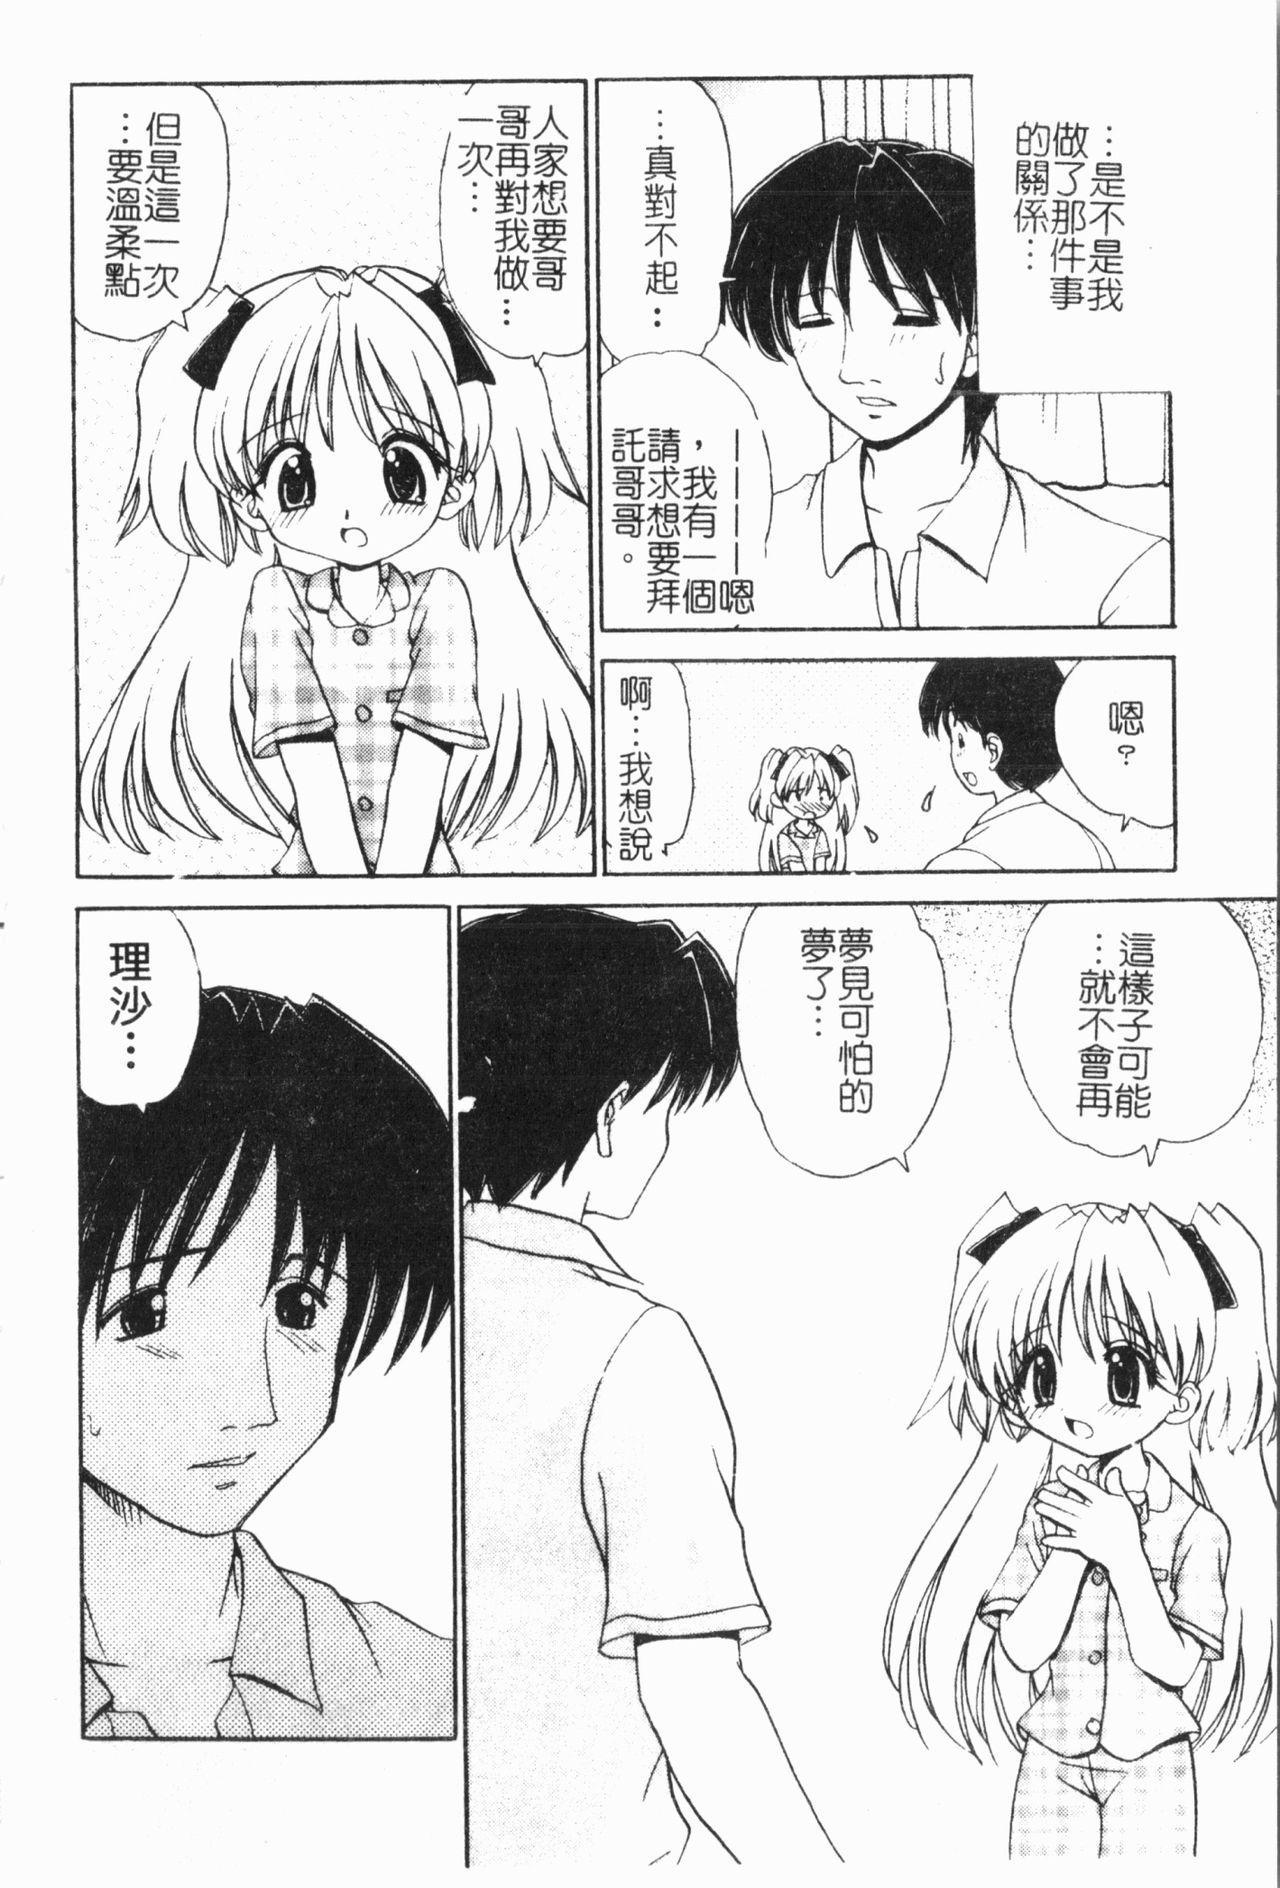 Imouto Koishi 6 134